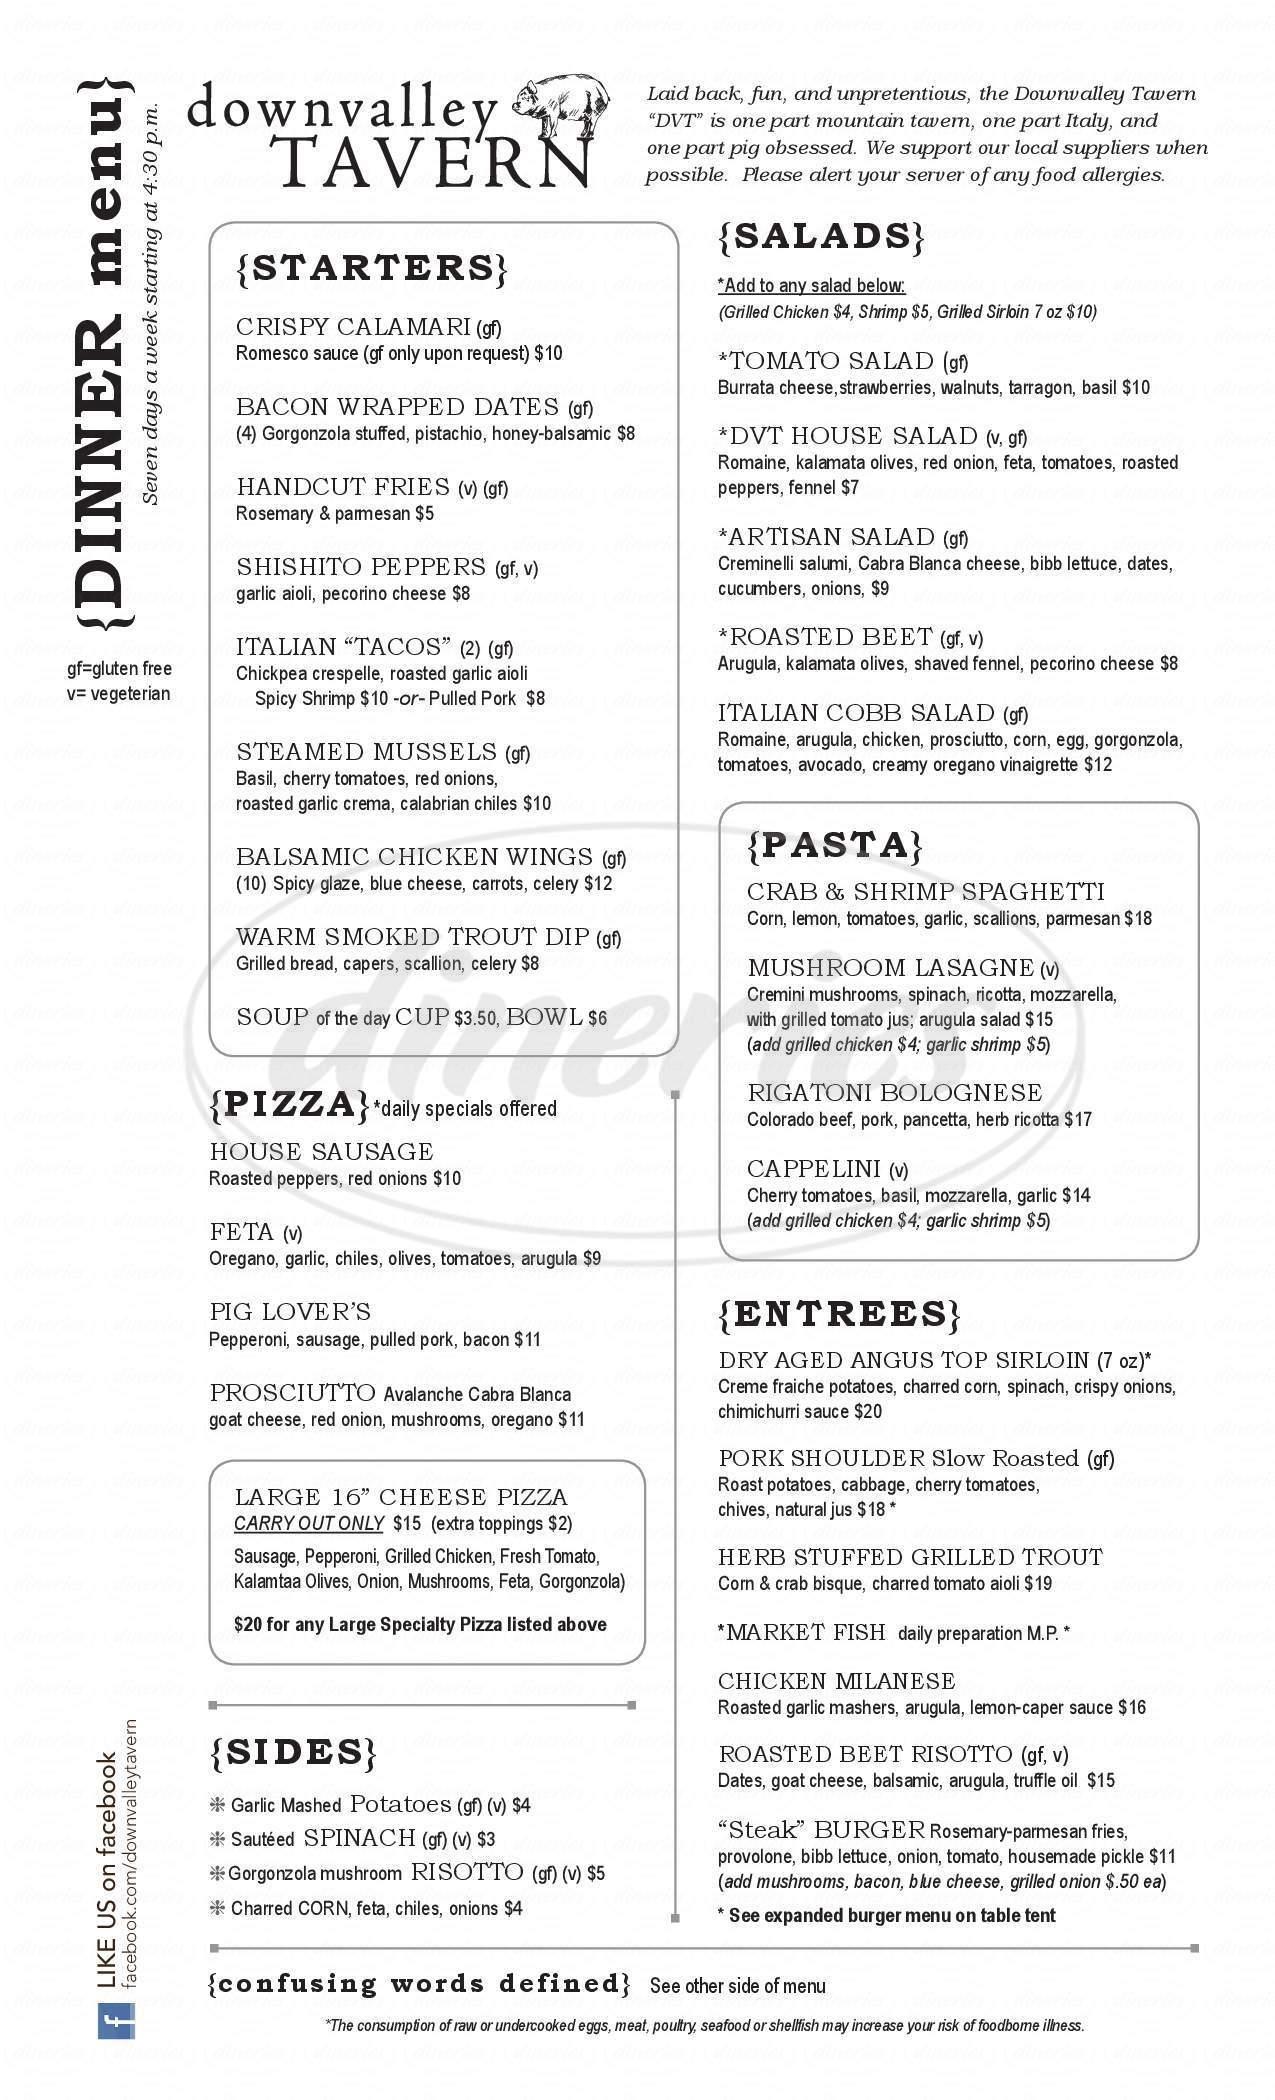 menu for Downvalley Tavern